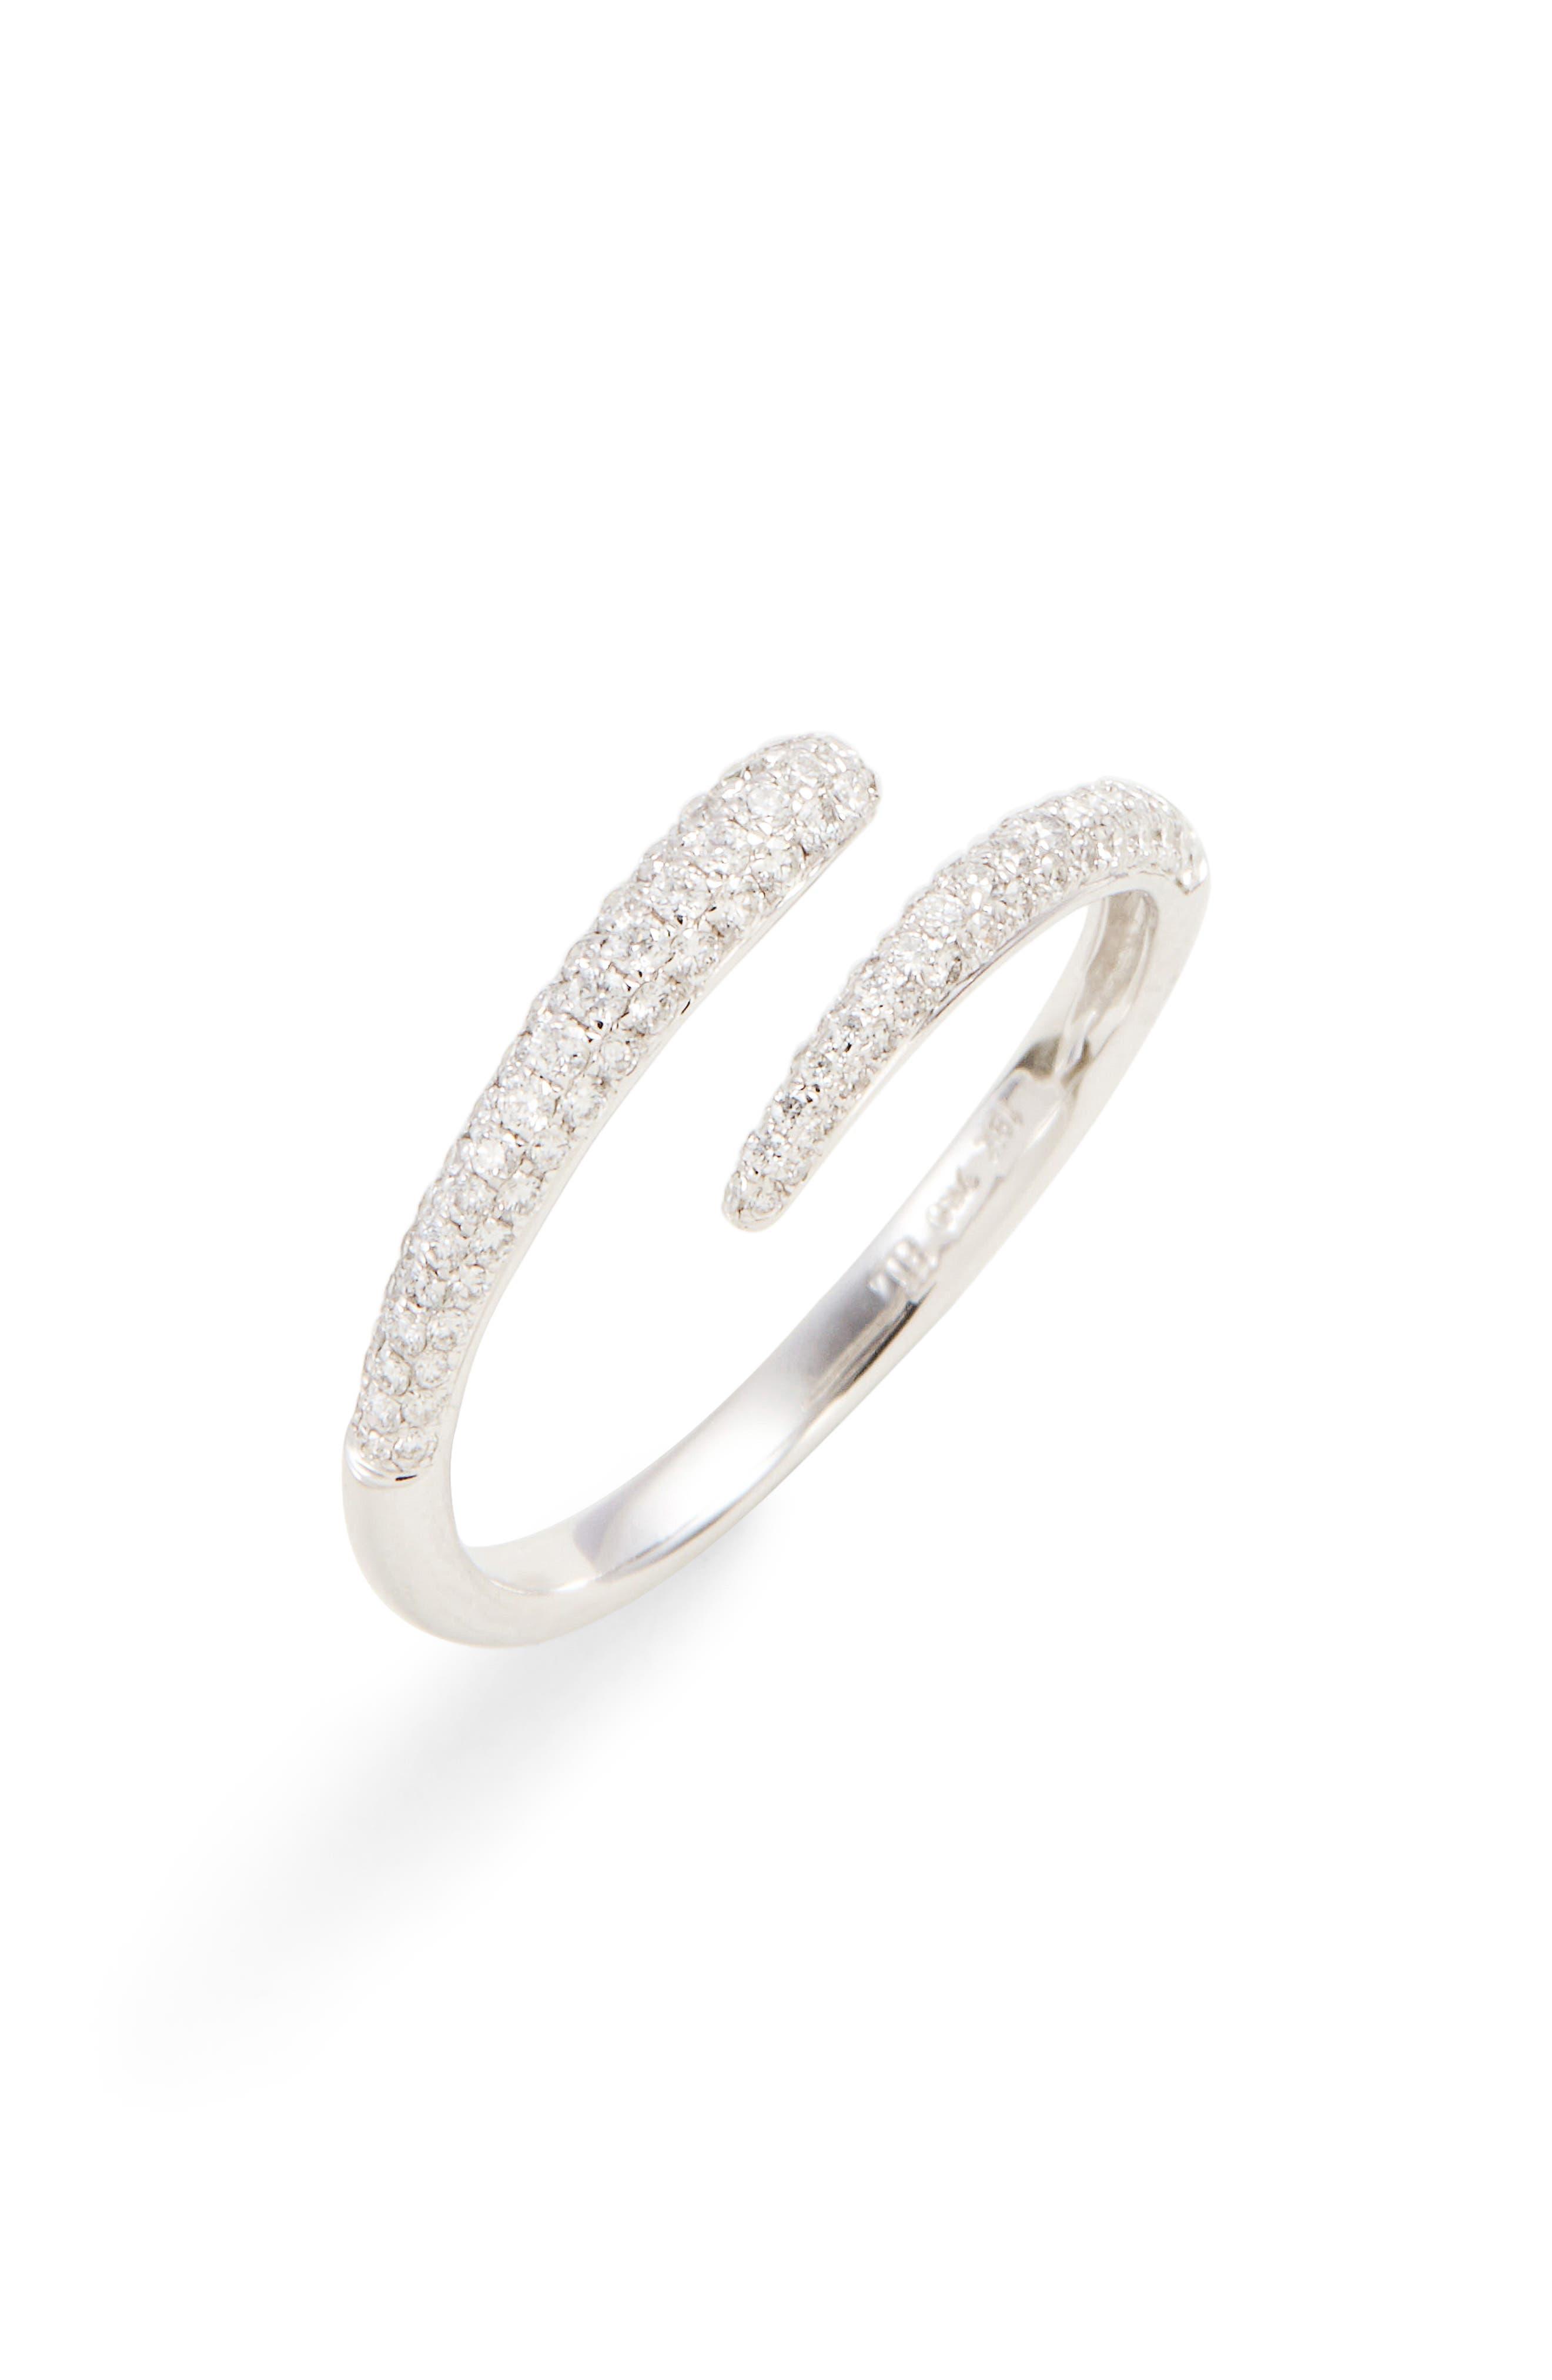 Alternate Image 1 Selected - Bony Levy Micro Pavé Diamond Openwork Ring (Nordstrom Exclusive)